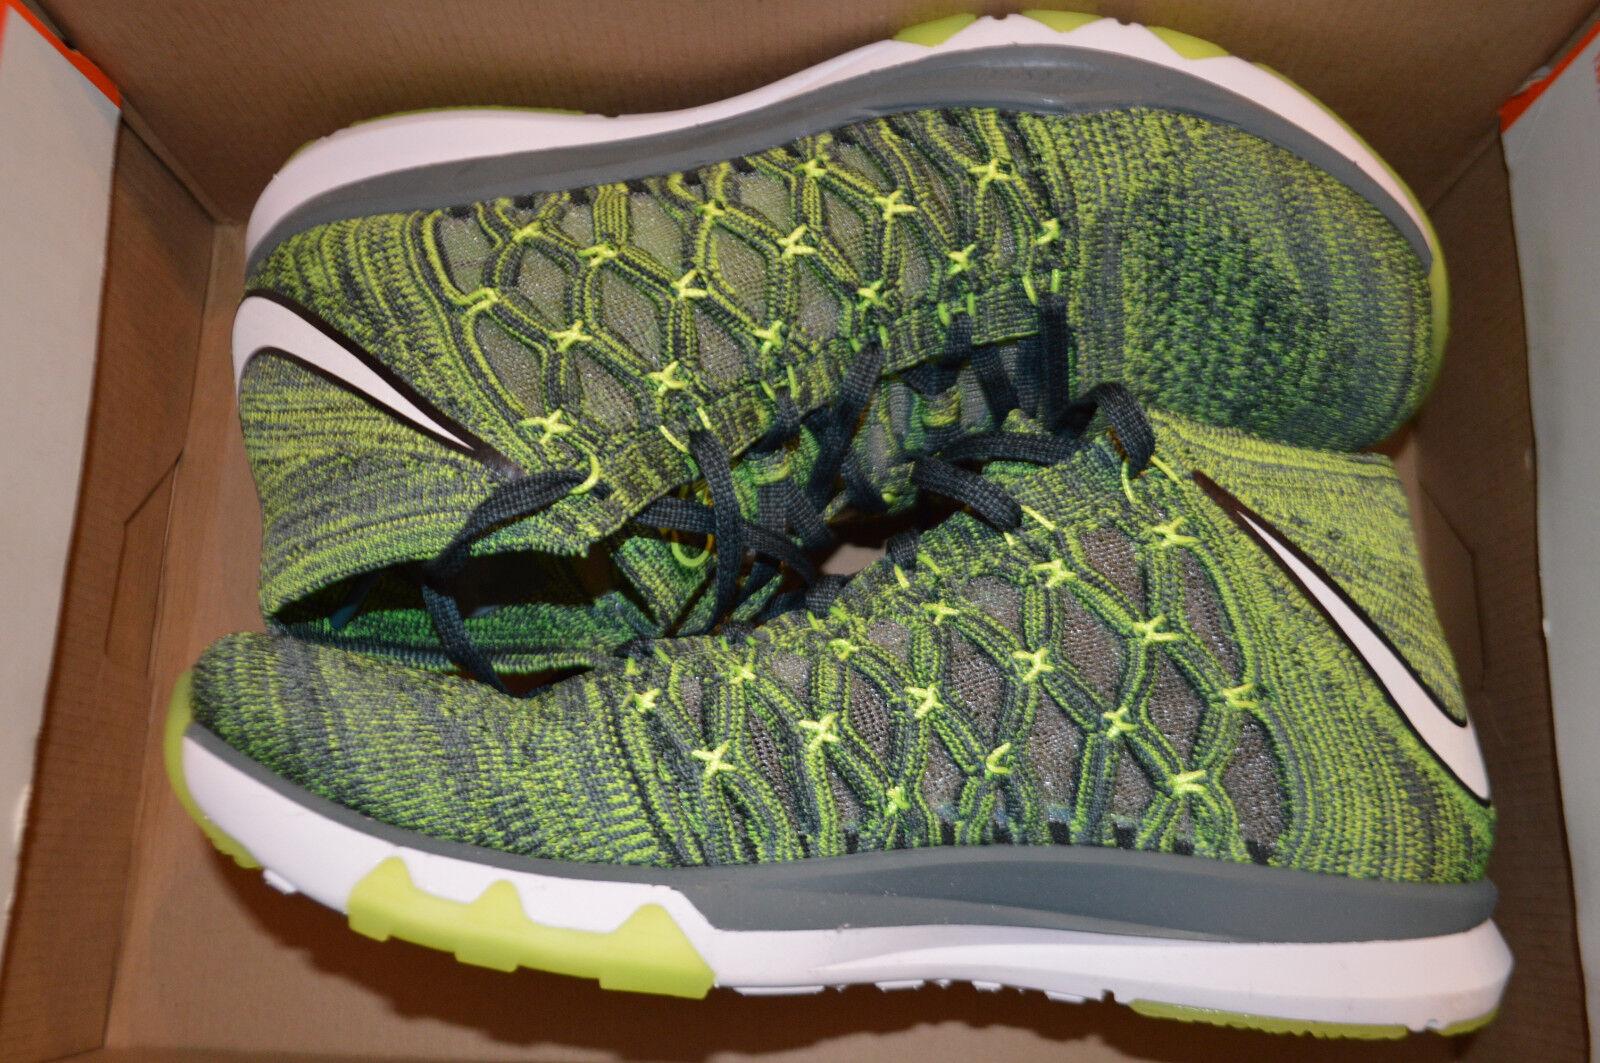 New New New Nike Mens Train Ultrafast Flyknit CR7 Ronaldo shoes 852927-300 sz 10 c030a3